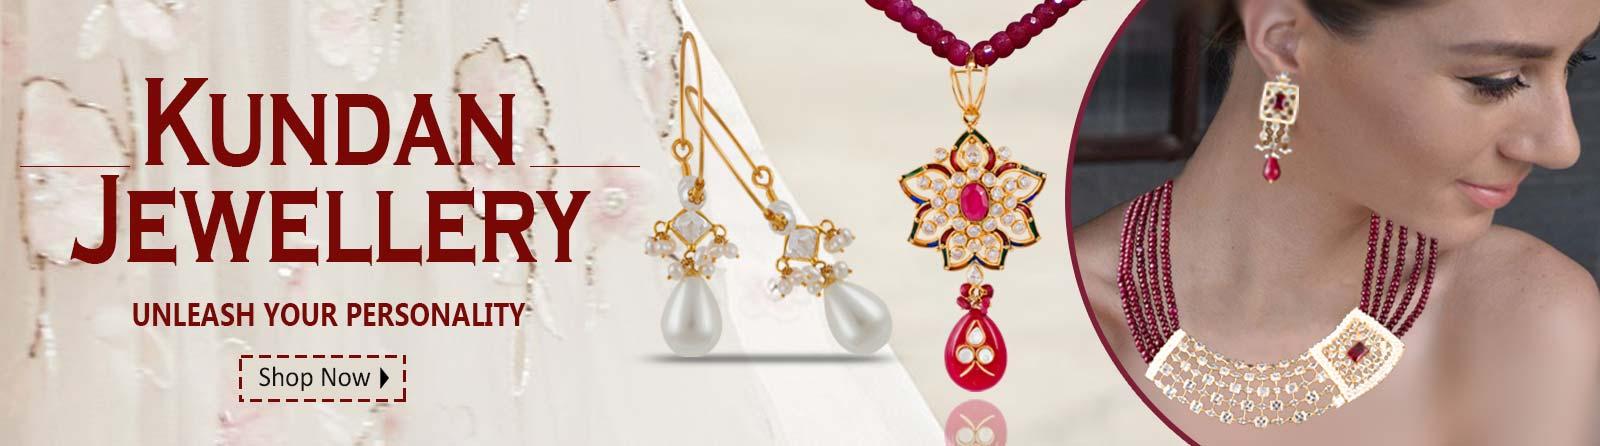 Kundan Polki Open Setting Gold Jewellery Banner